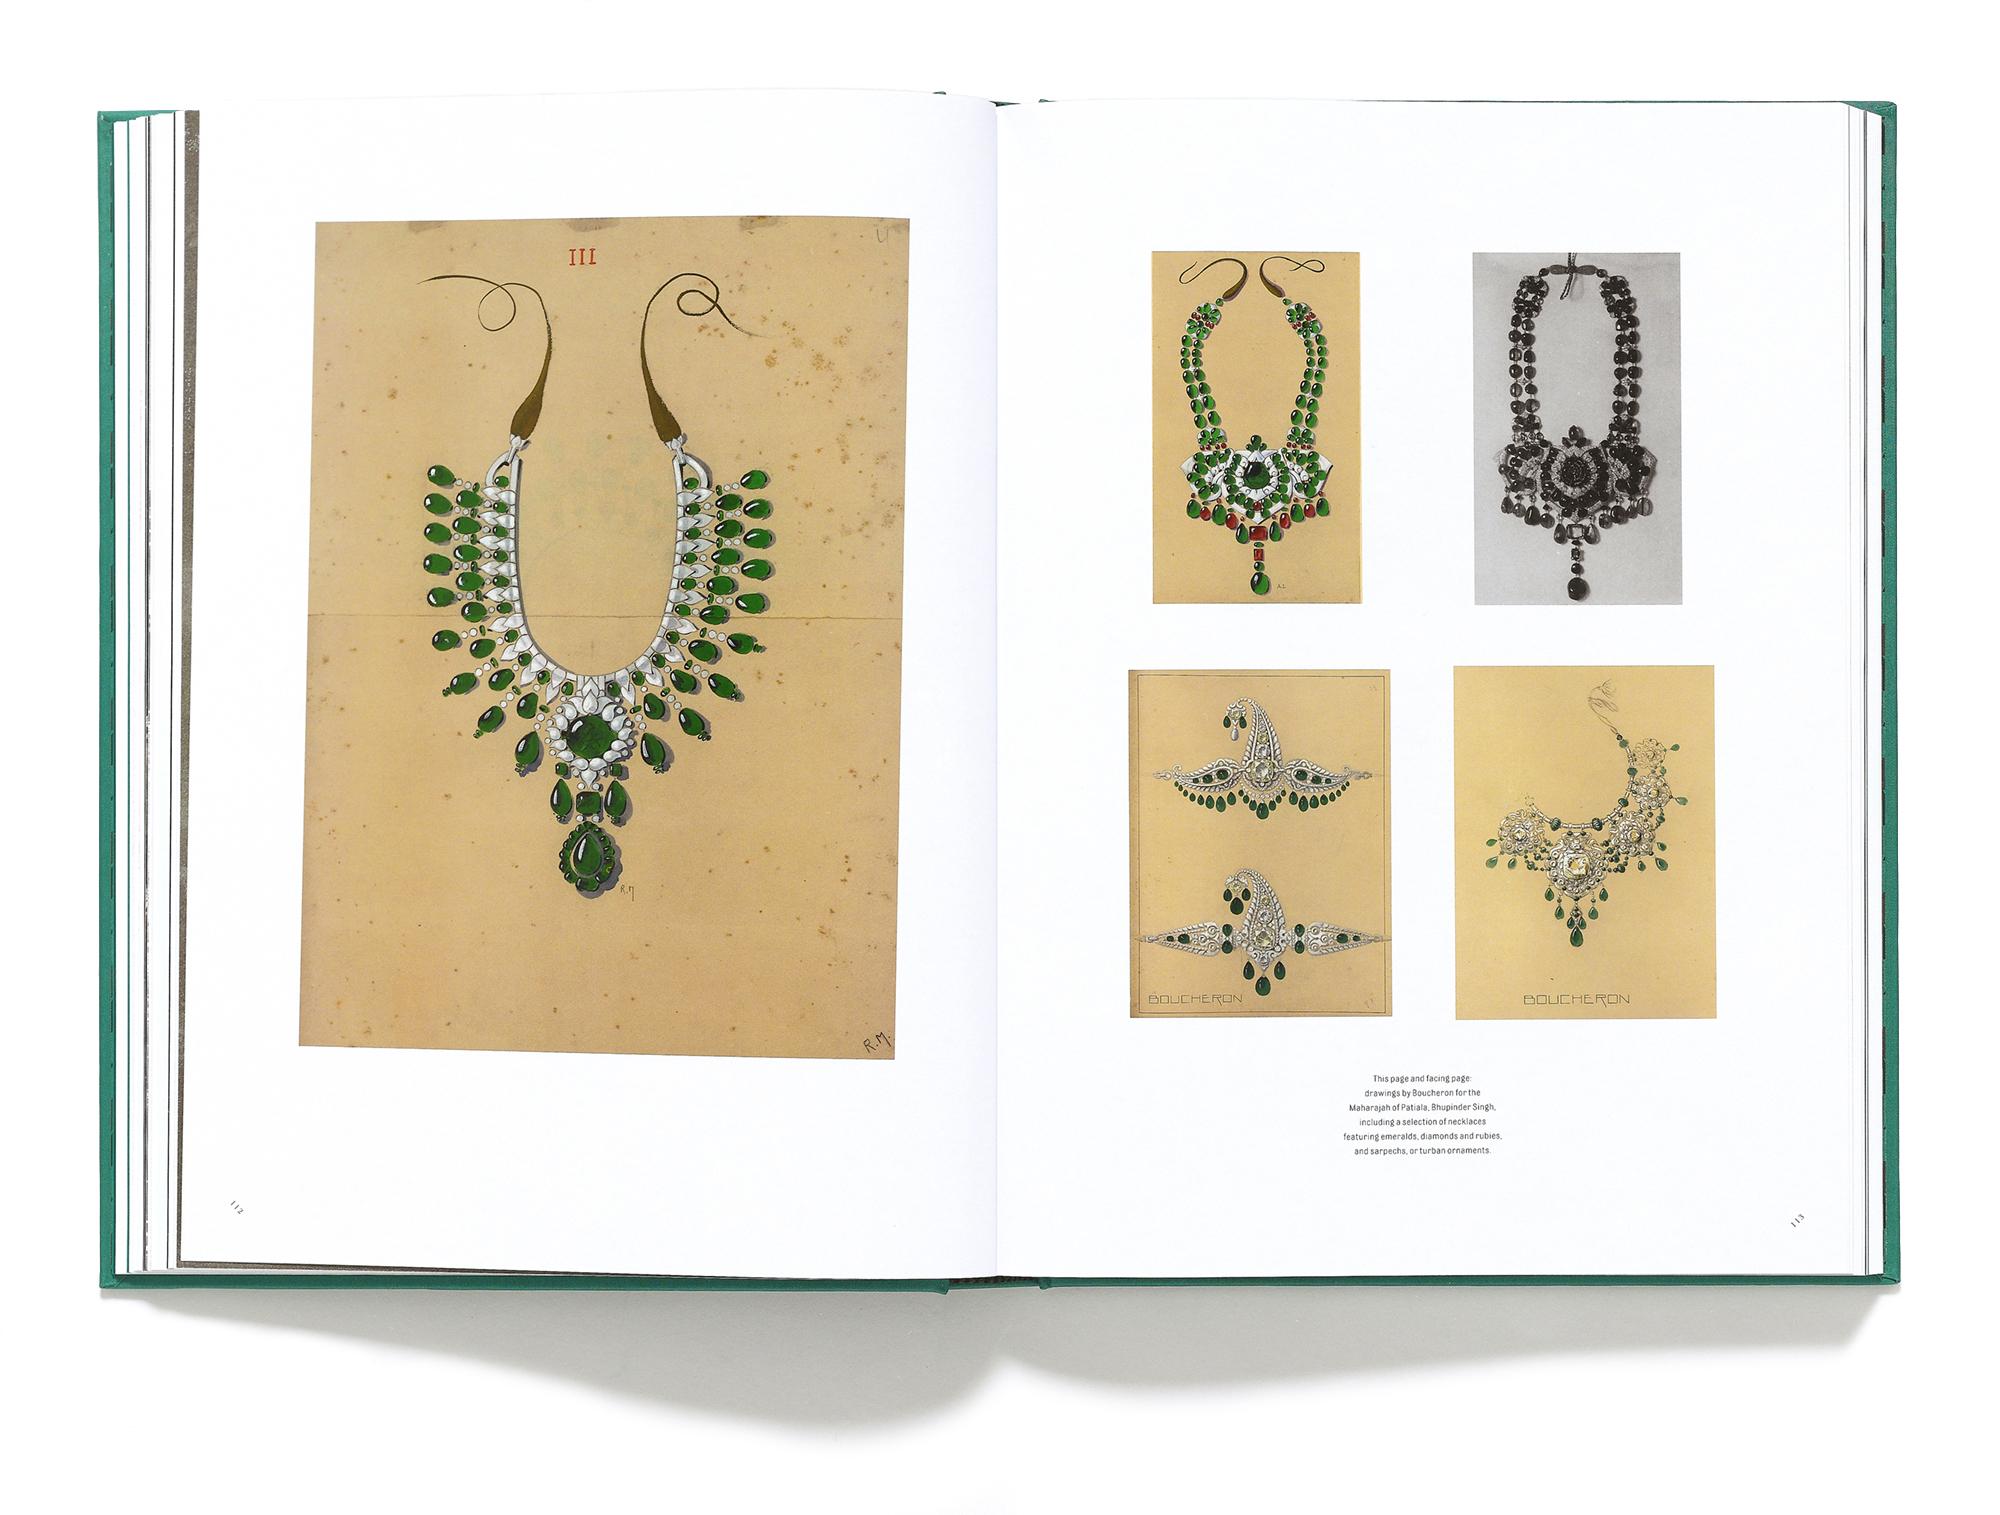 Emerald_Violette Editions_31.jpg